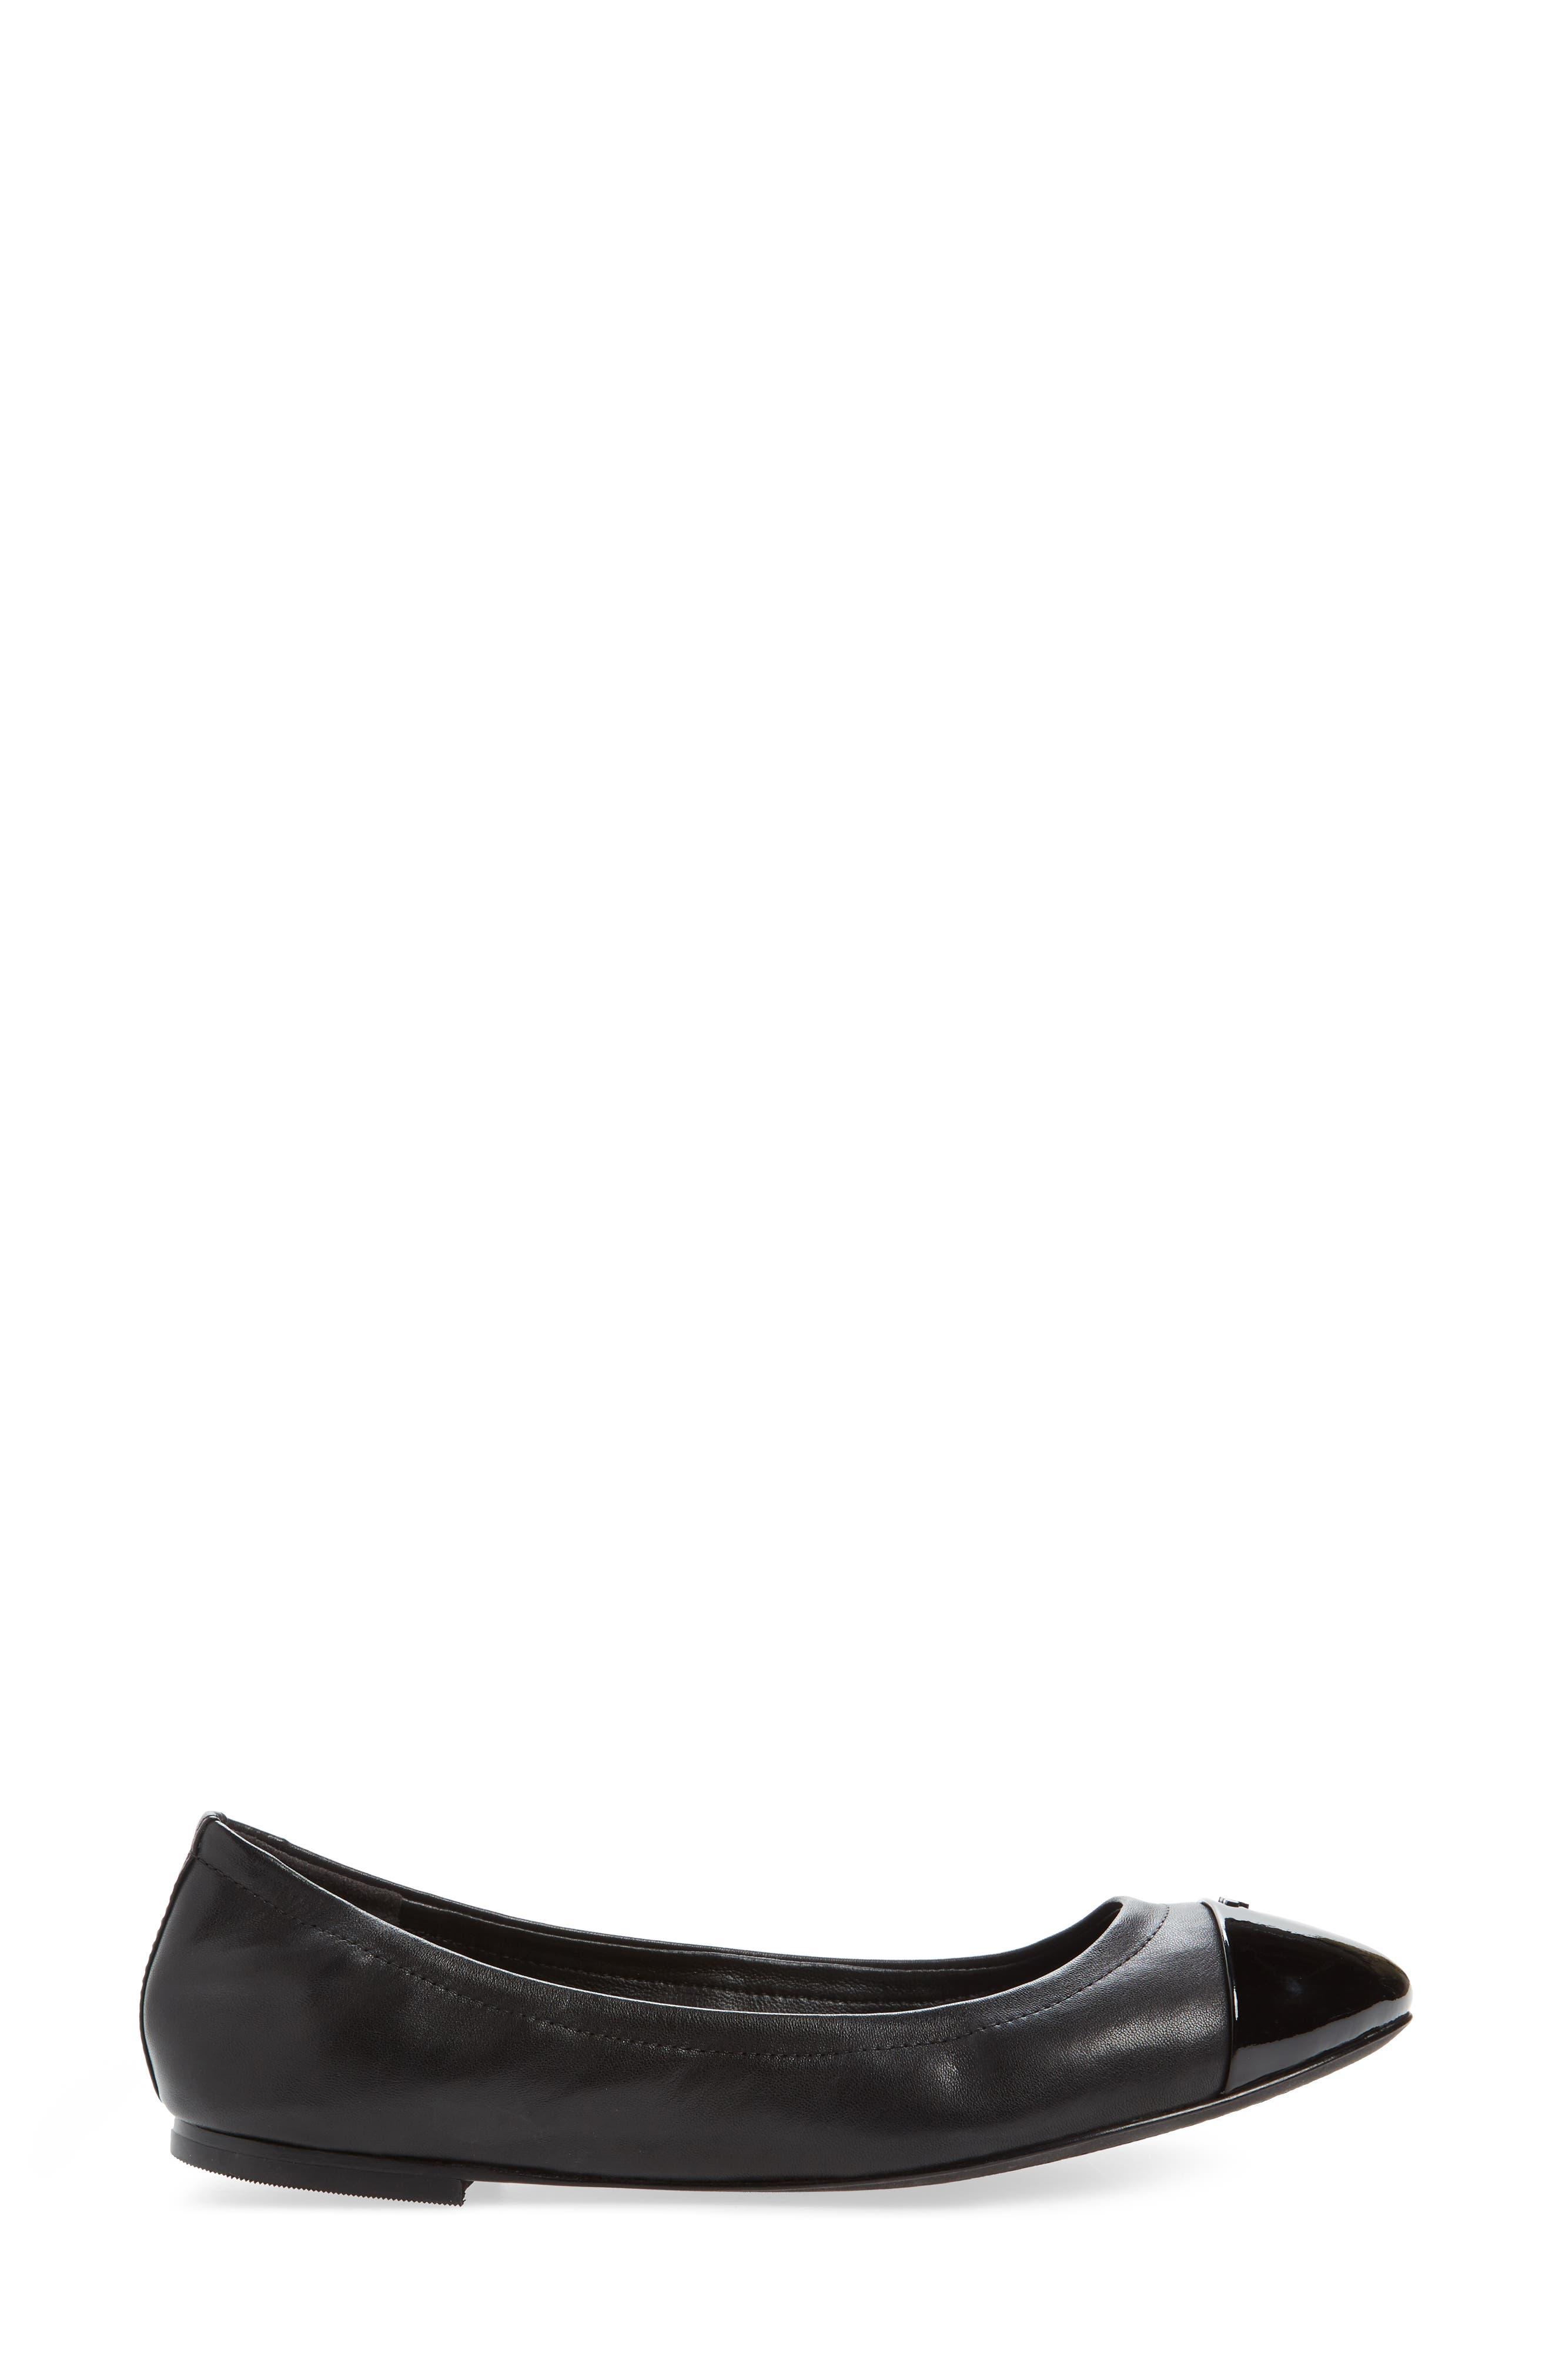 Shelby Cap Toe Ballet Flat,                             Alternate thumbnail 3, color,                             Black/ Black